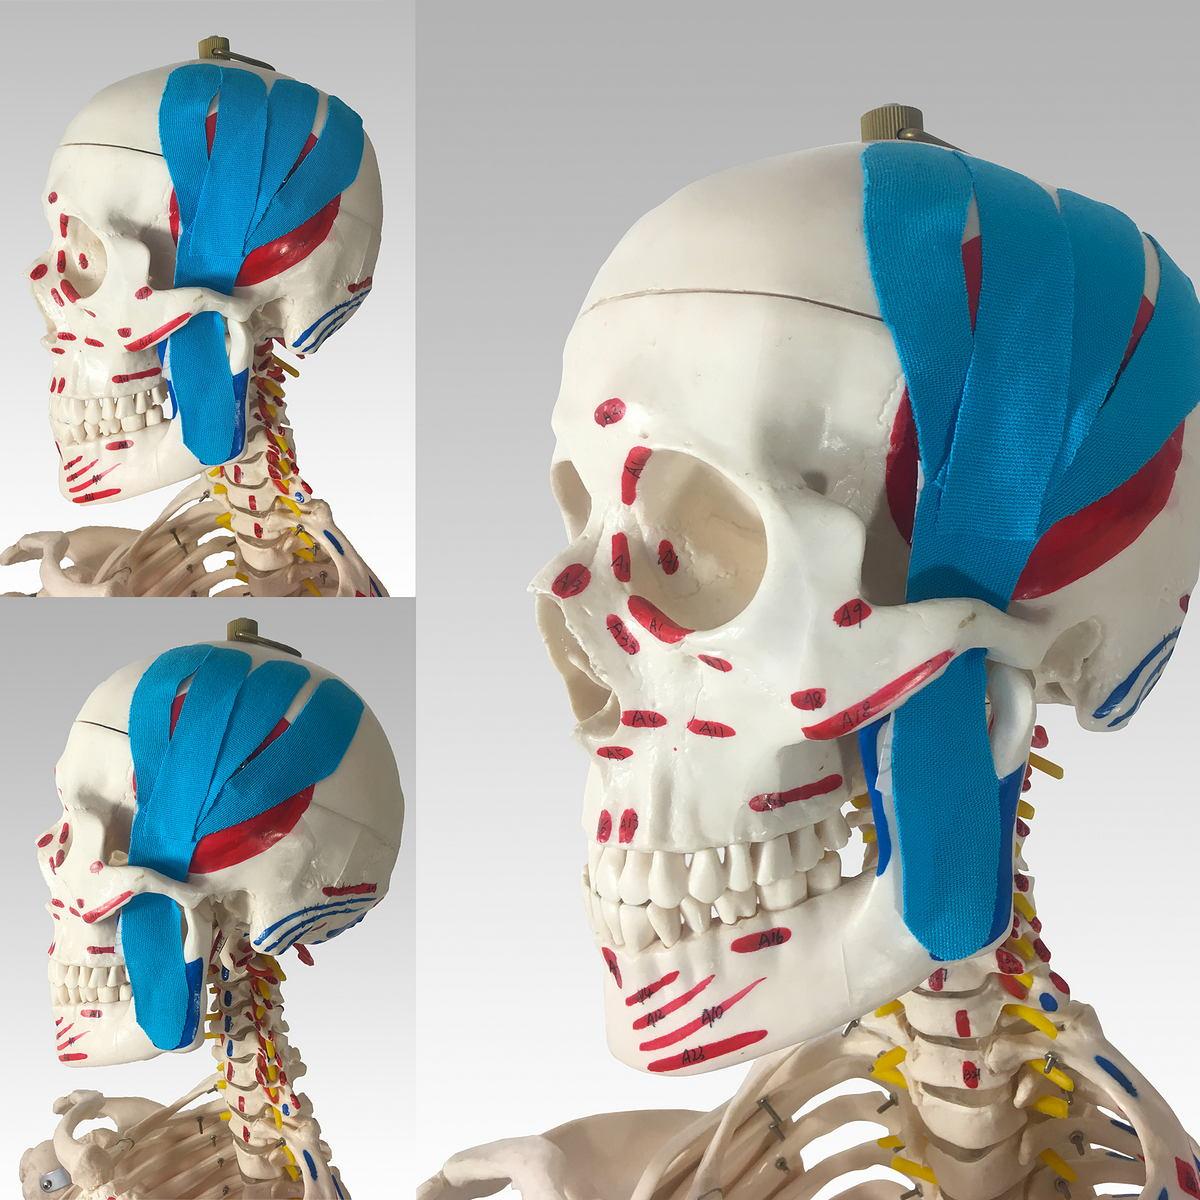 miesien-skroniowy-anatomia